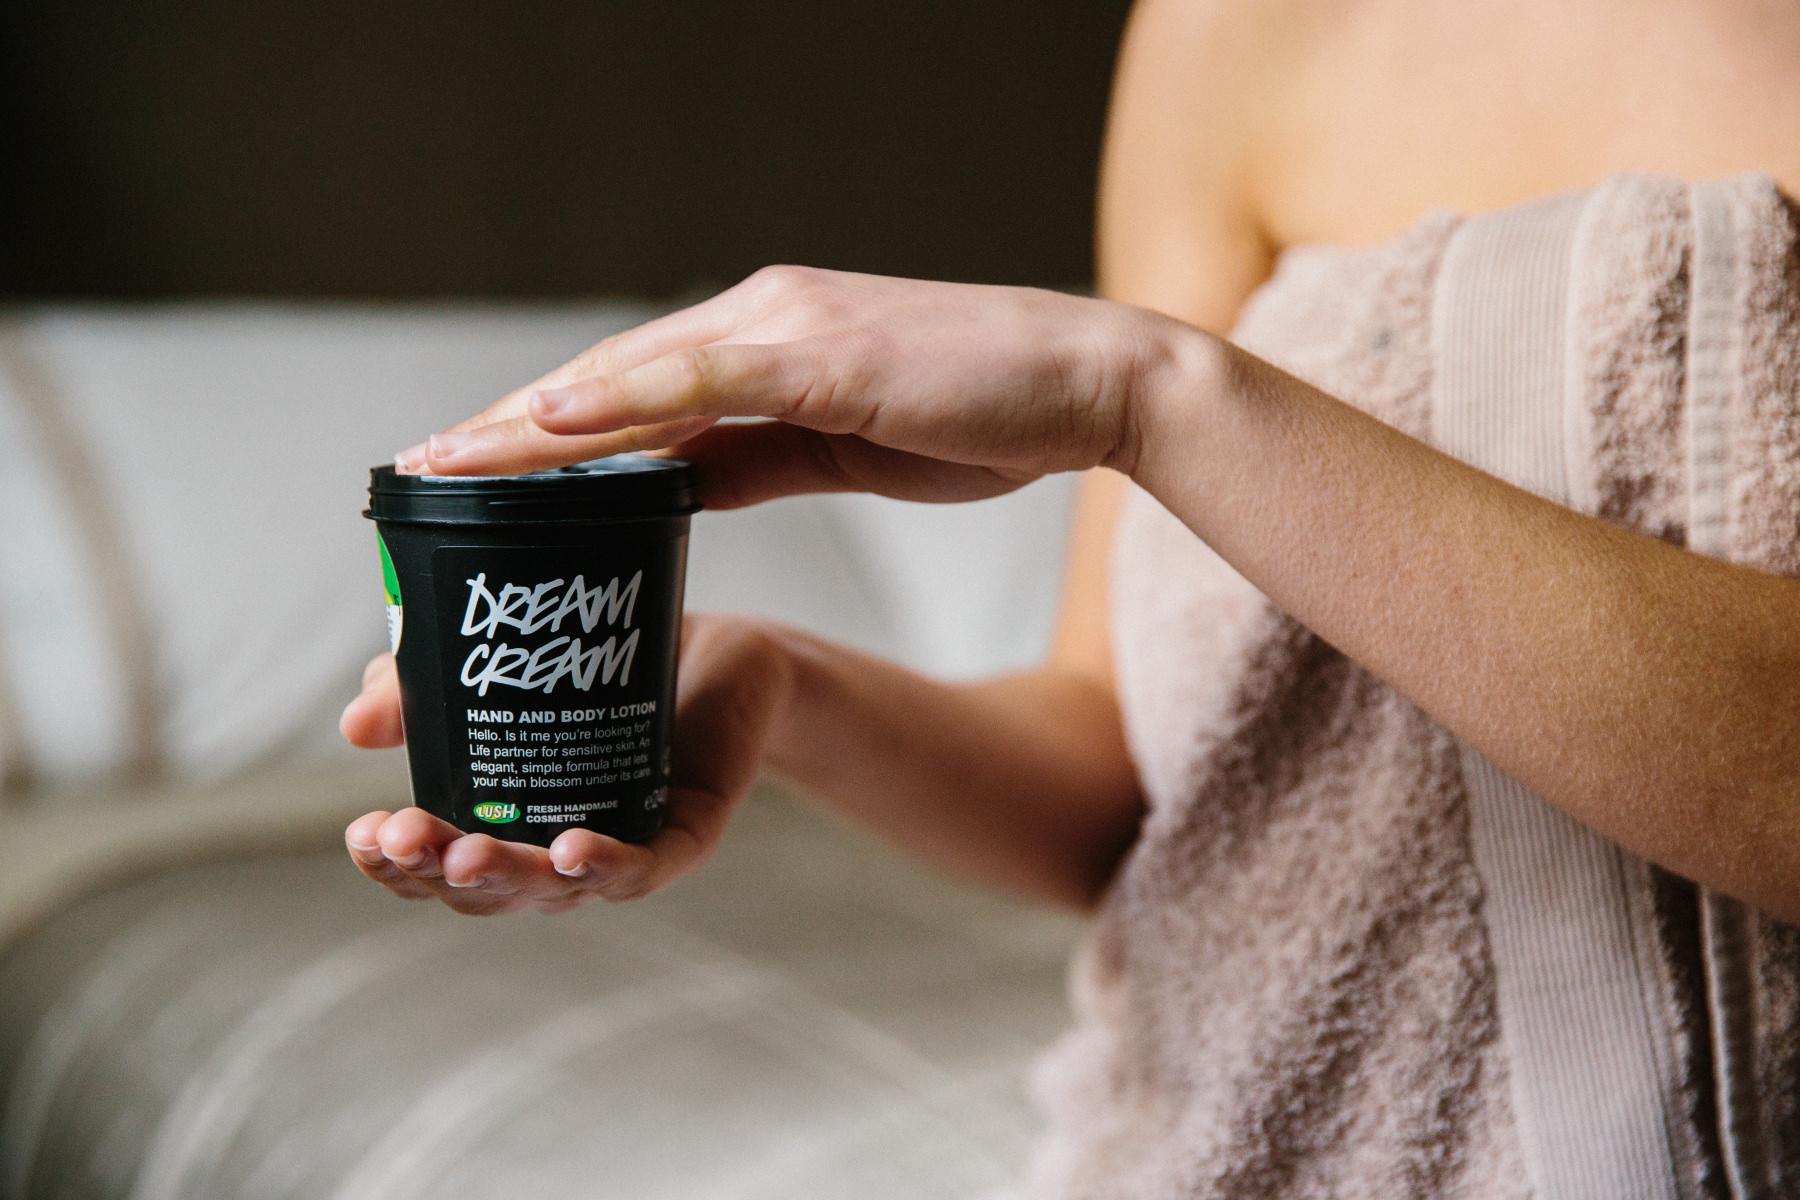 Žena drží kelímek tělového krému Dream Cream